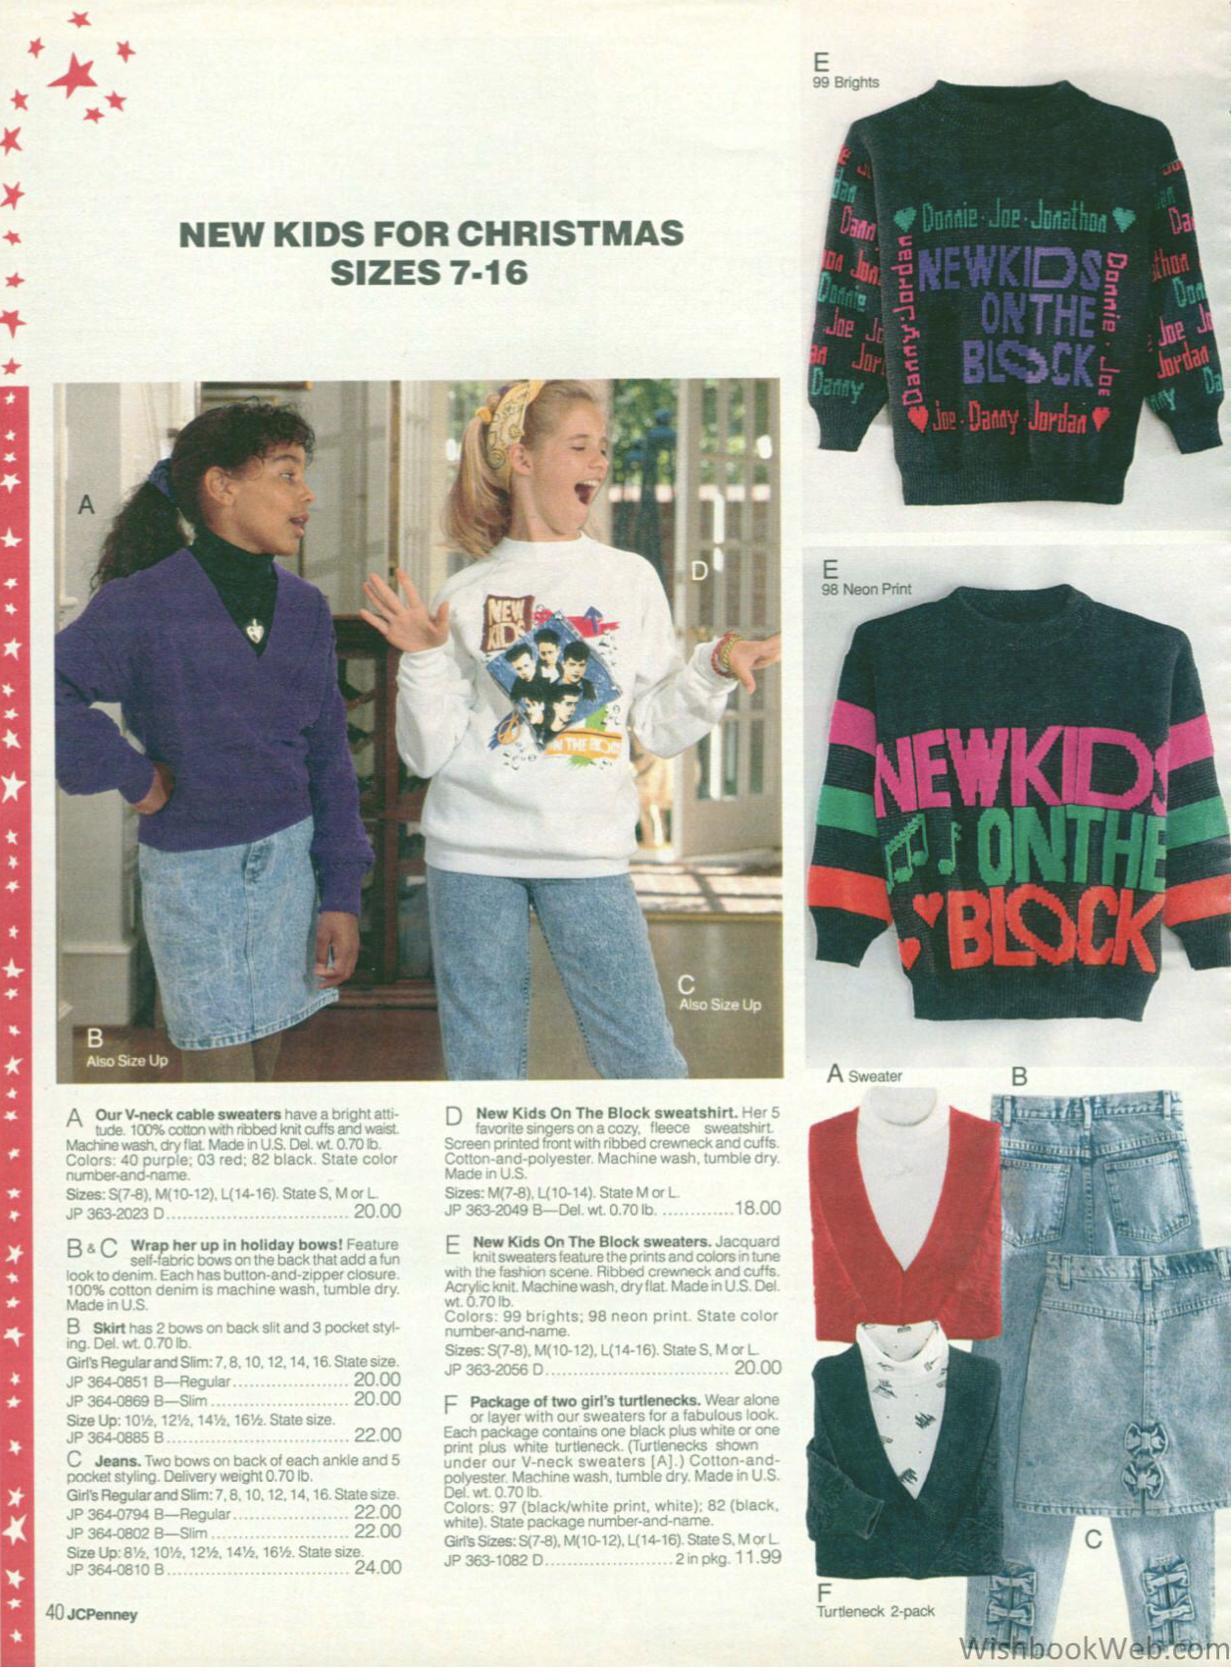 Nikki - New Kids on the Block Outfits - wishbookweb.com